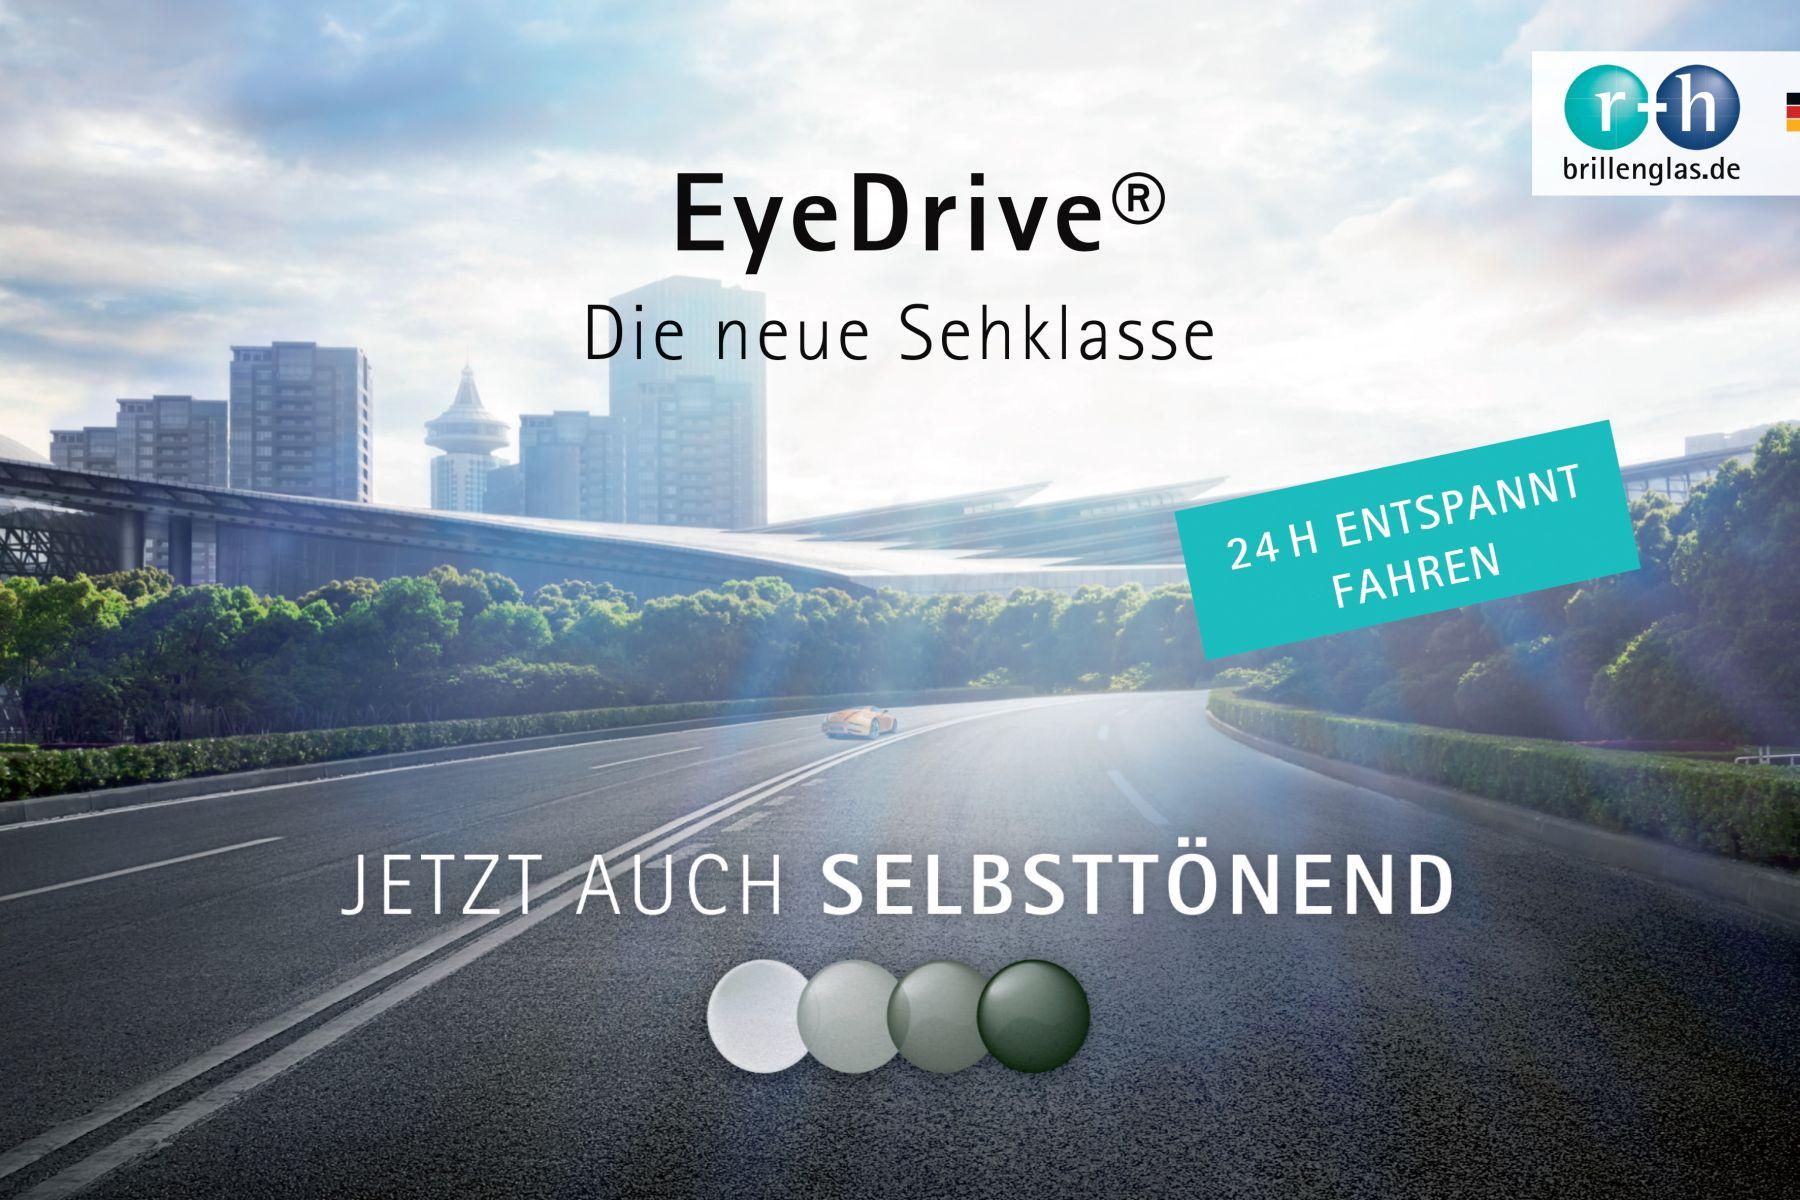 EyeDrive selbsttönend